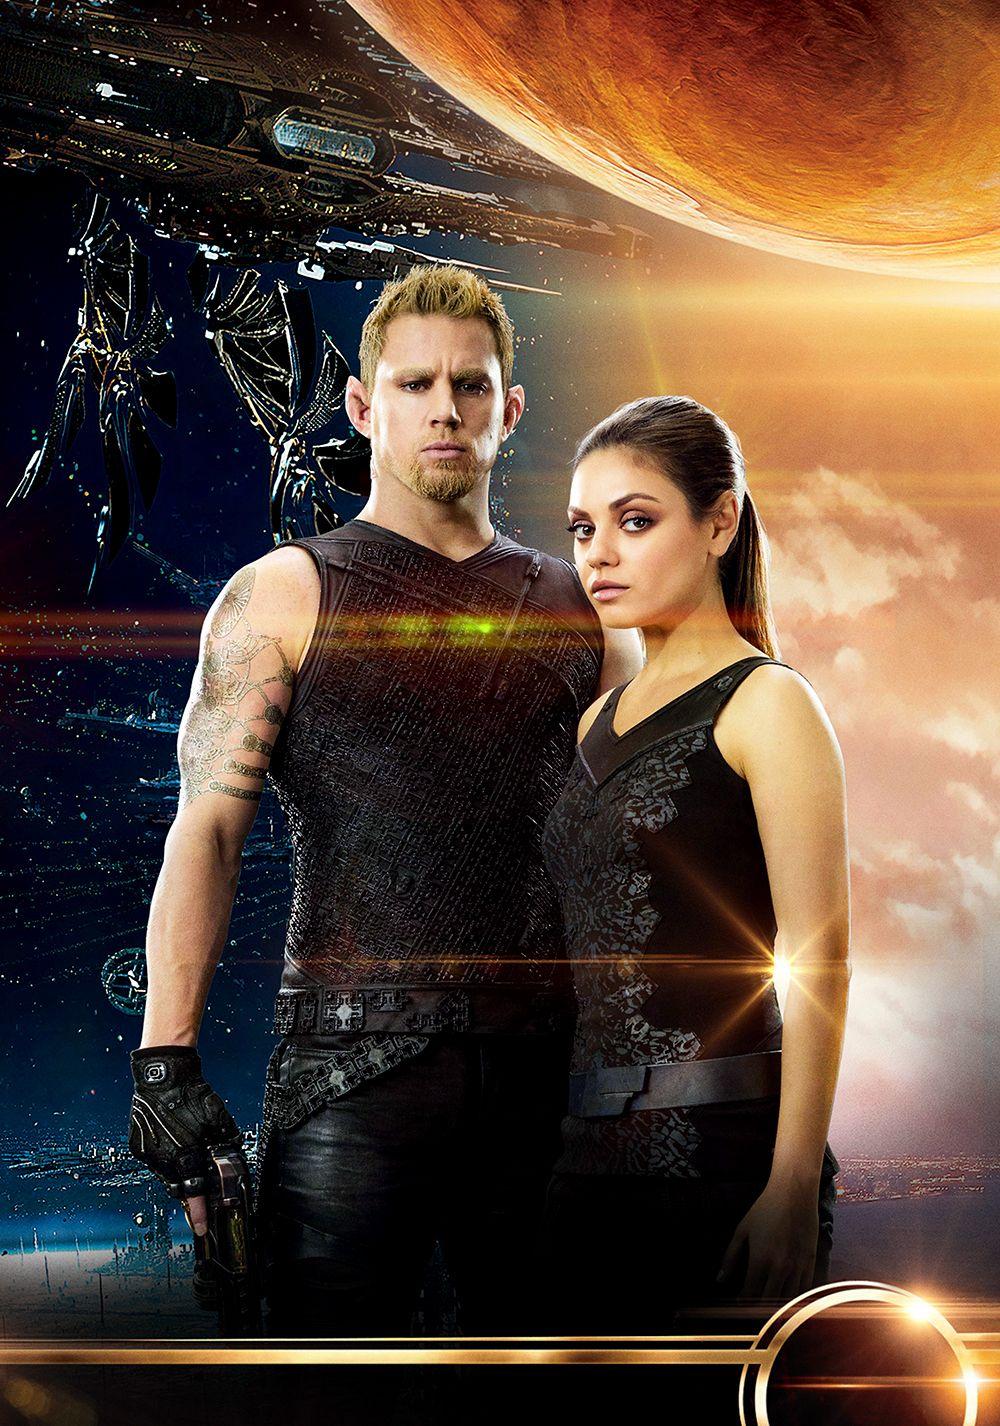 Mila Kunis Jupiter Ascending 2015 1000 1426 Jupiter Ascending Movie Jupiter Ascending Great Movies To Watch